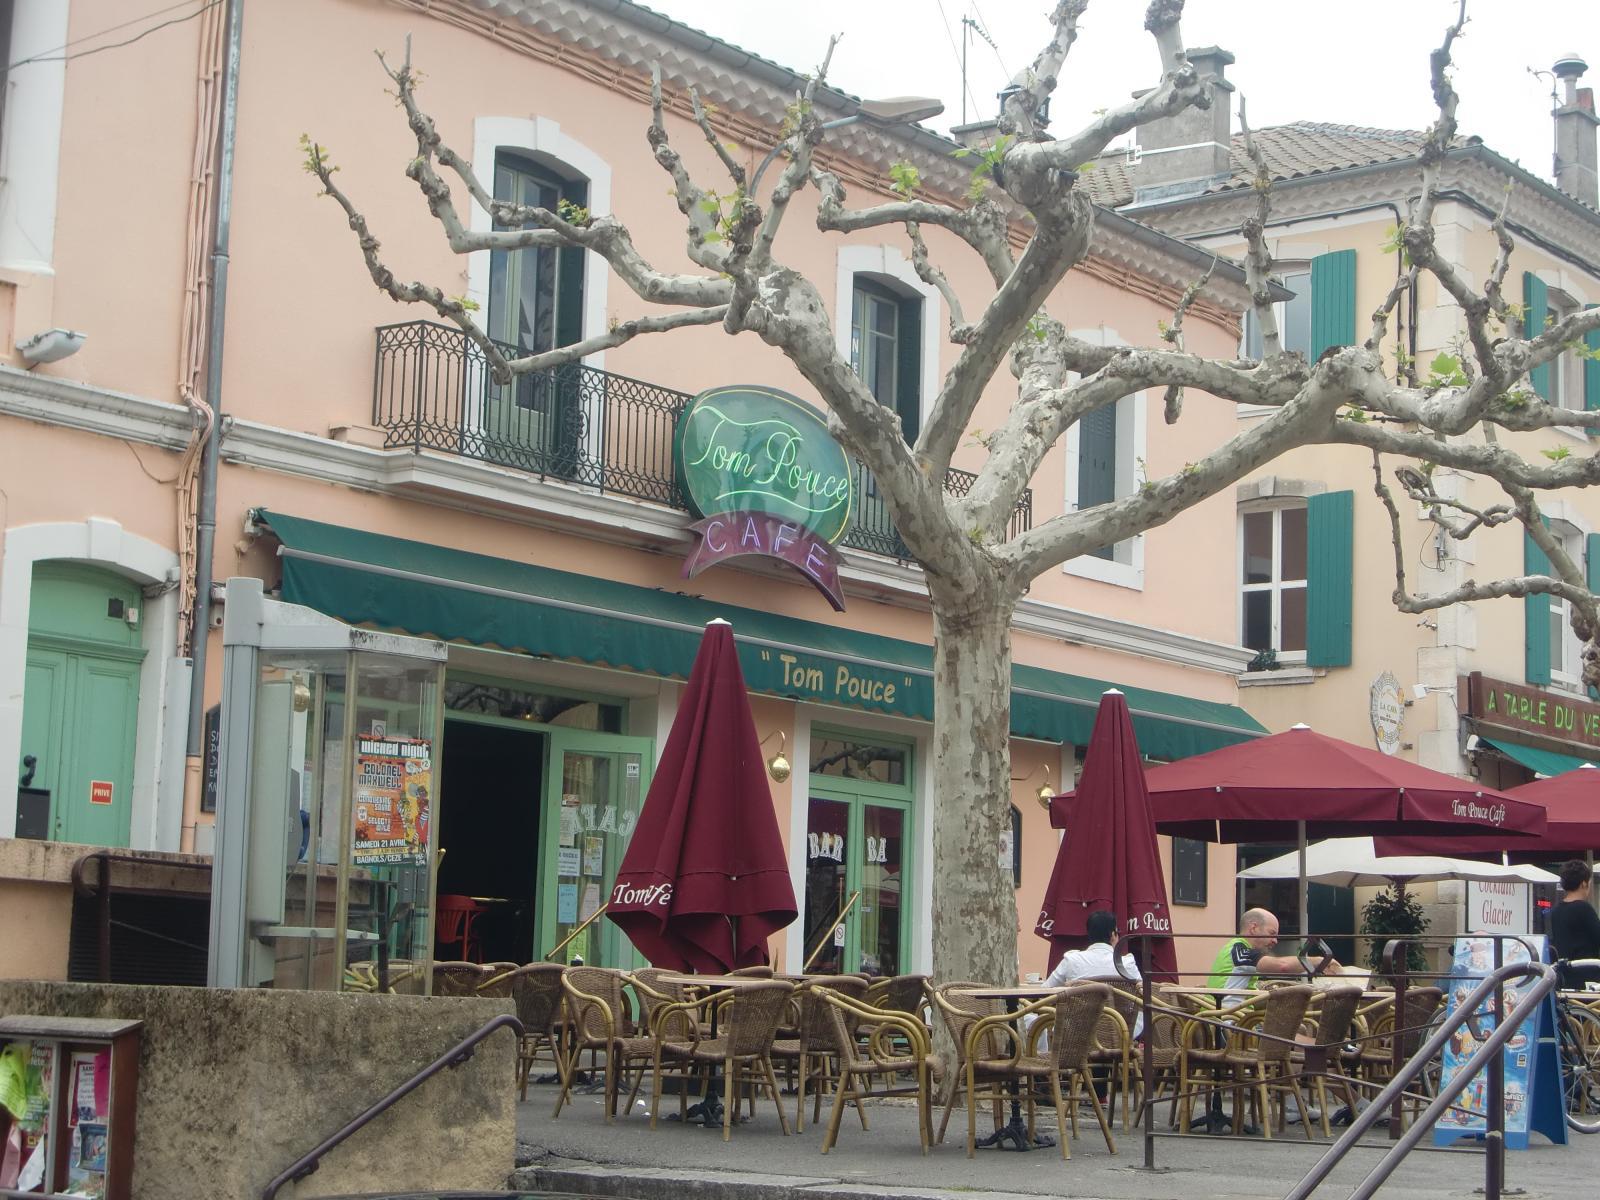 Tom pouce café Vallon tourisme